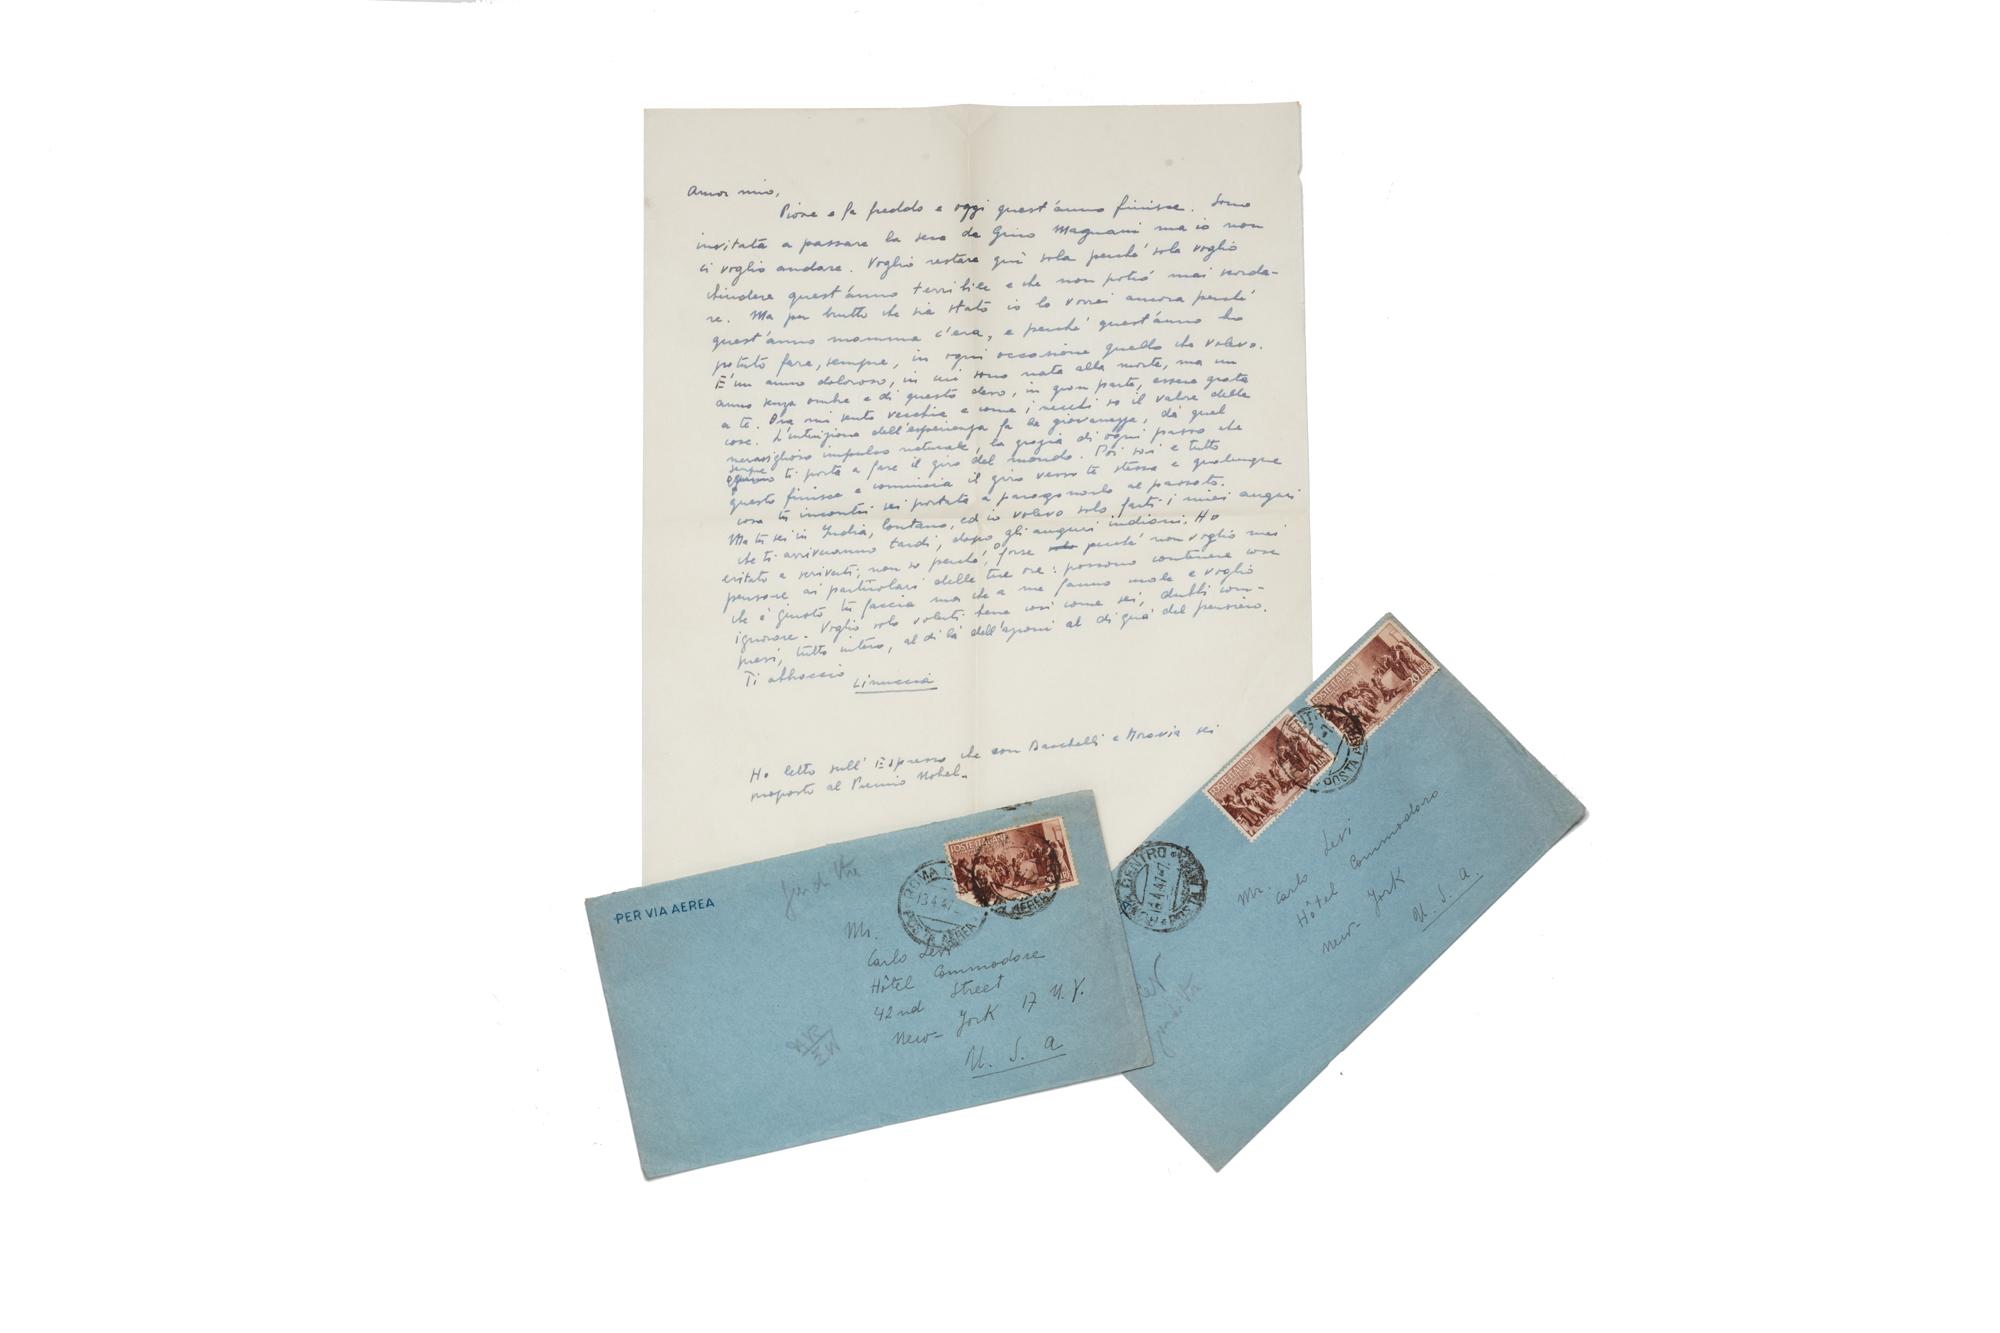 Lettere autografe a Carlo Levi